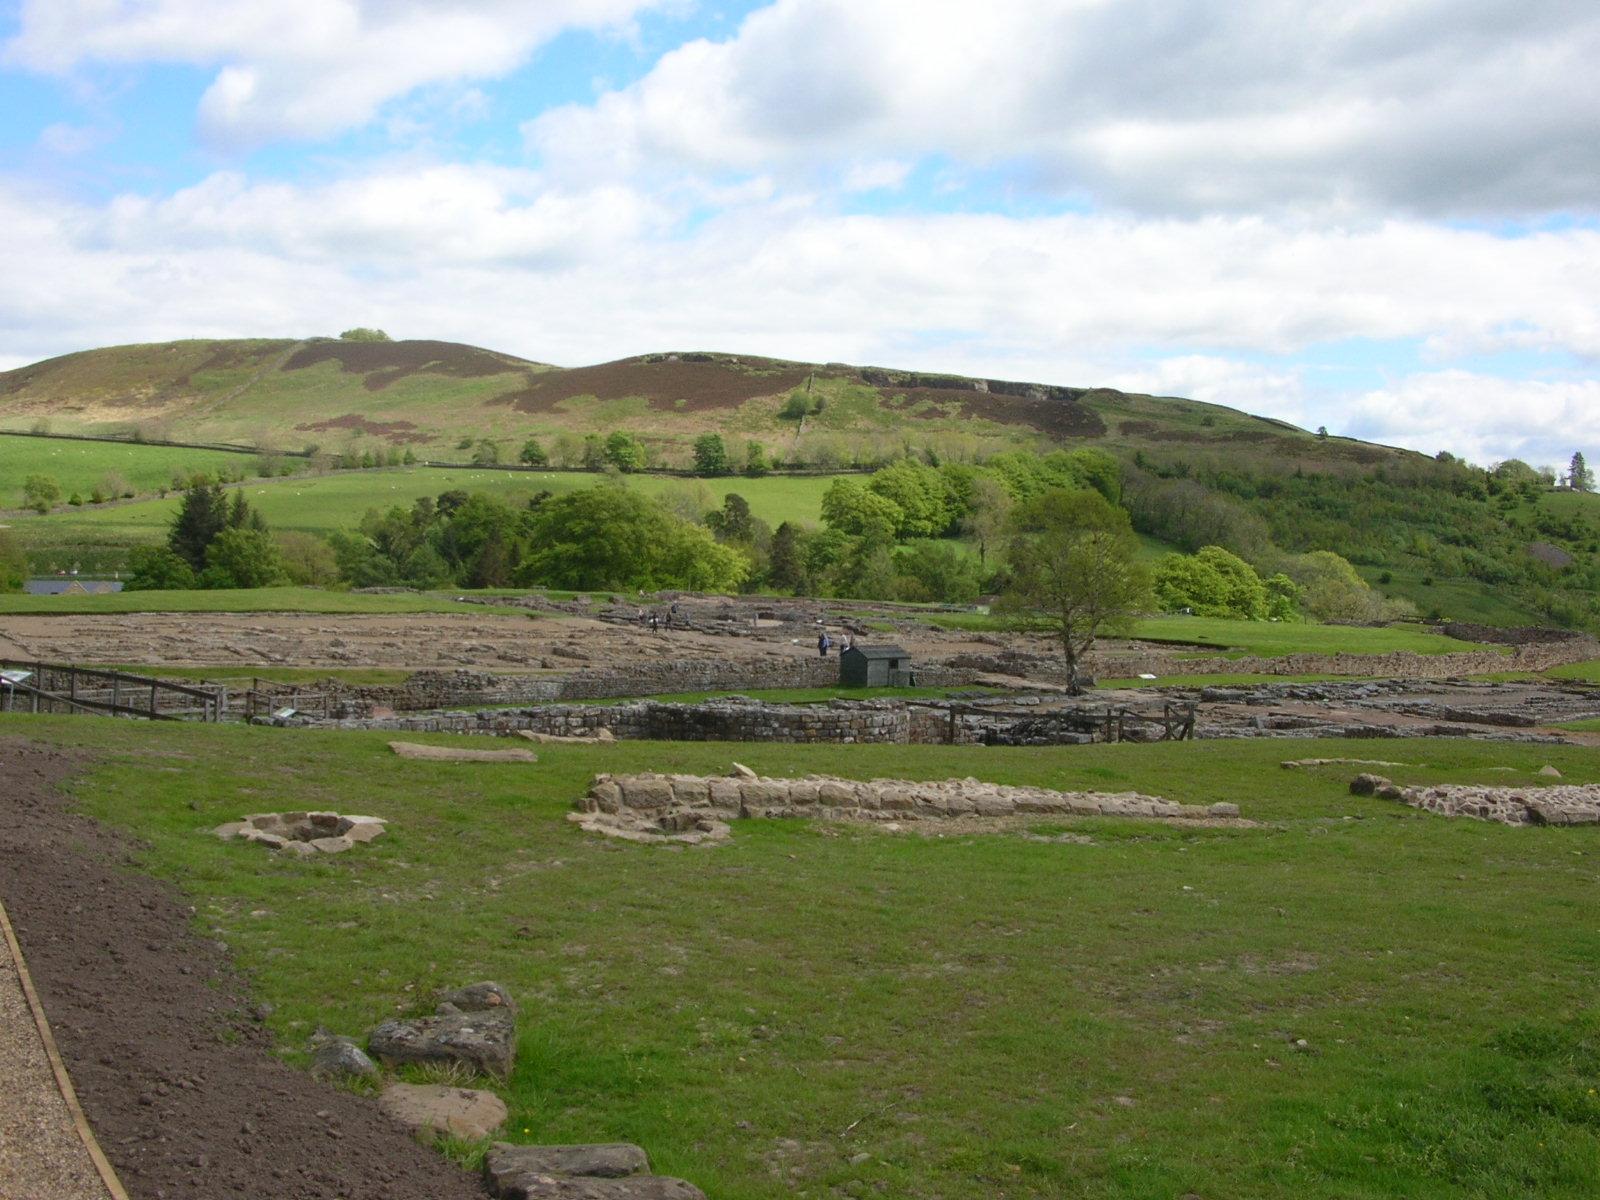 Vindolanda_trip_June_2103_005.jpg